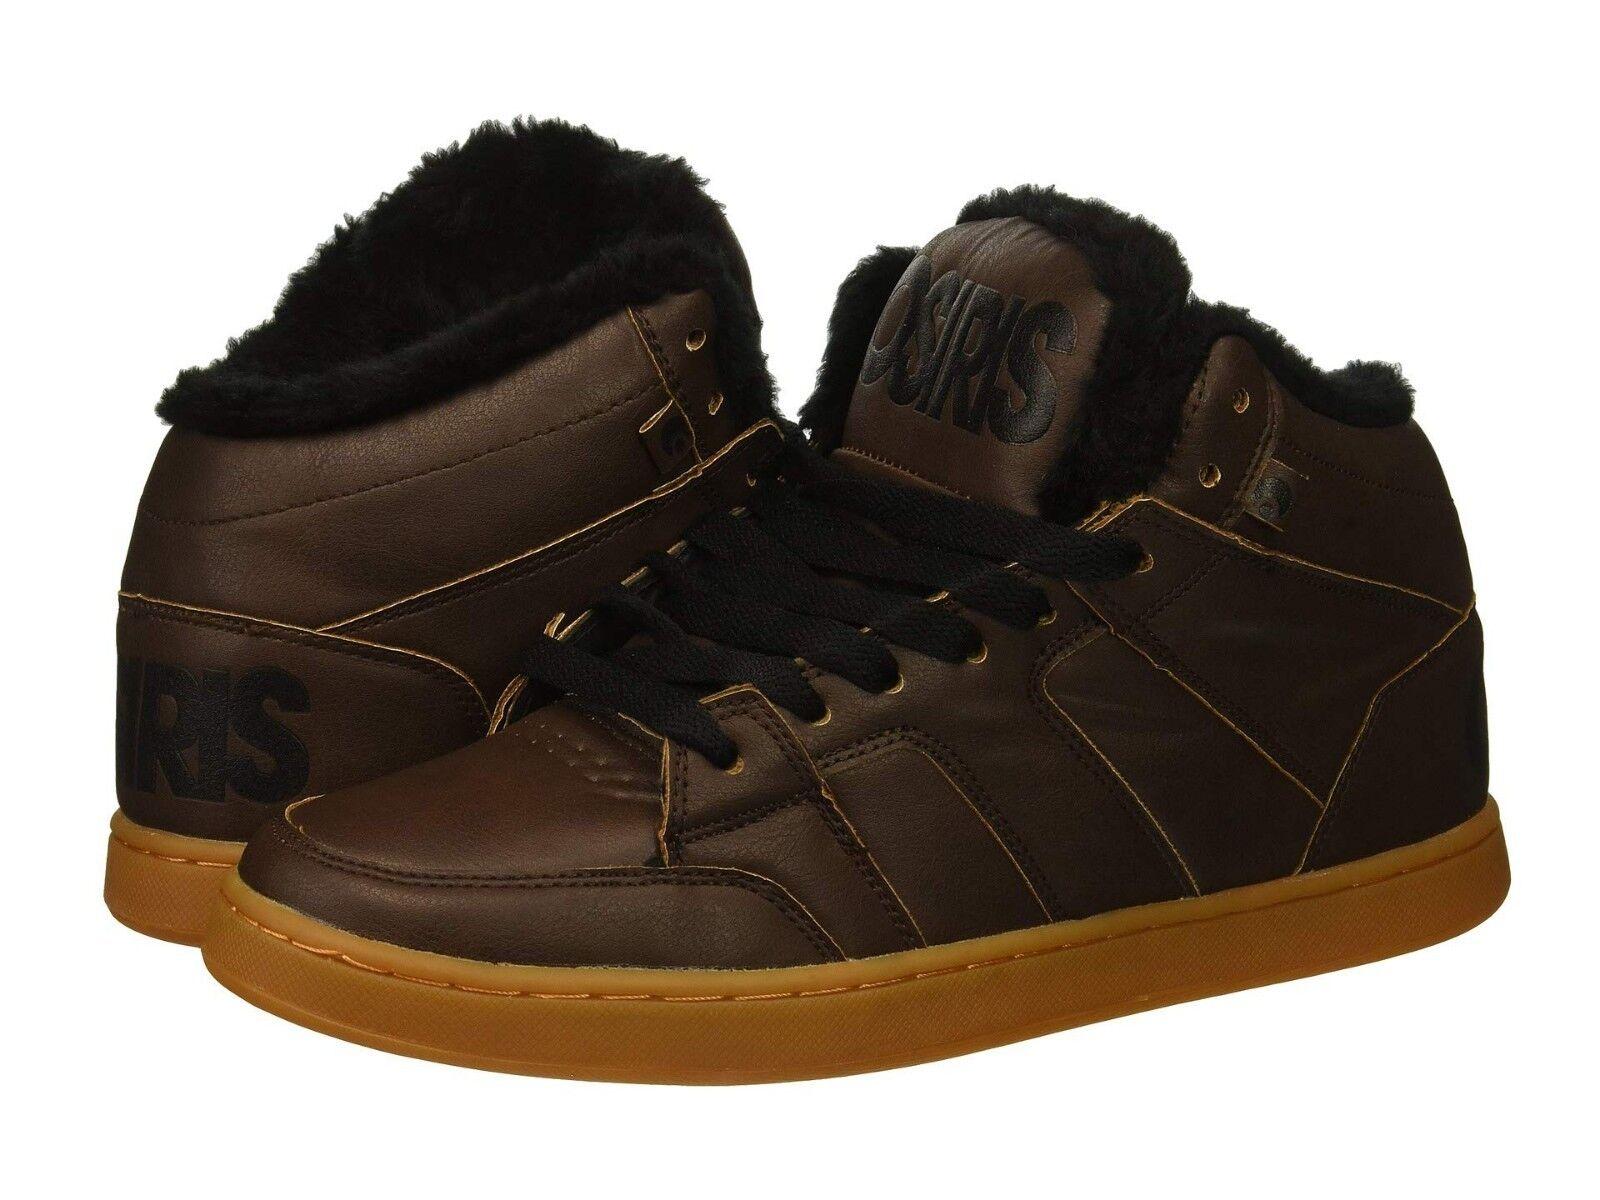 hommes OSIRIS CONVOY MID SHR SKATEBOARDING Chaussures NIB BROWN noir